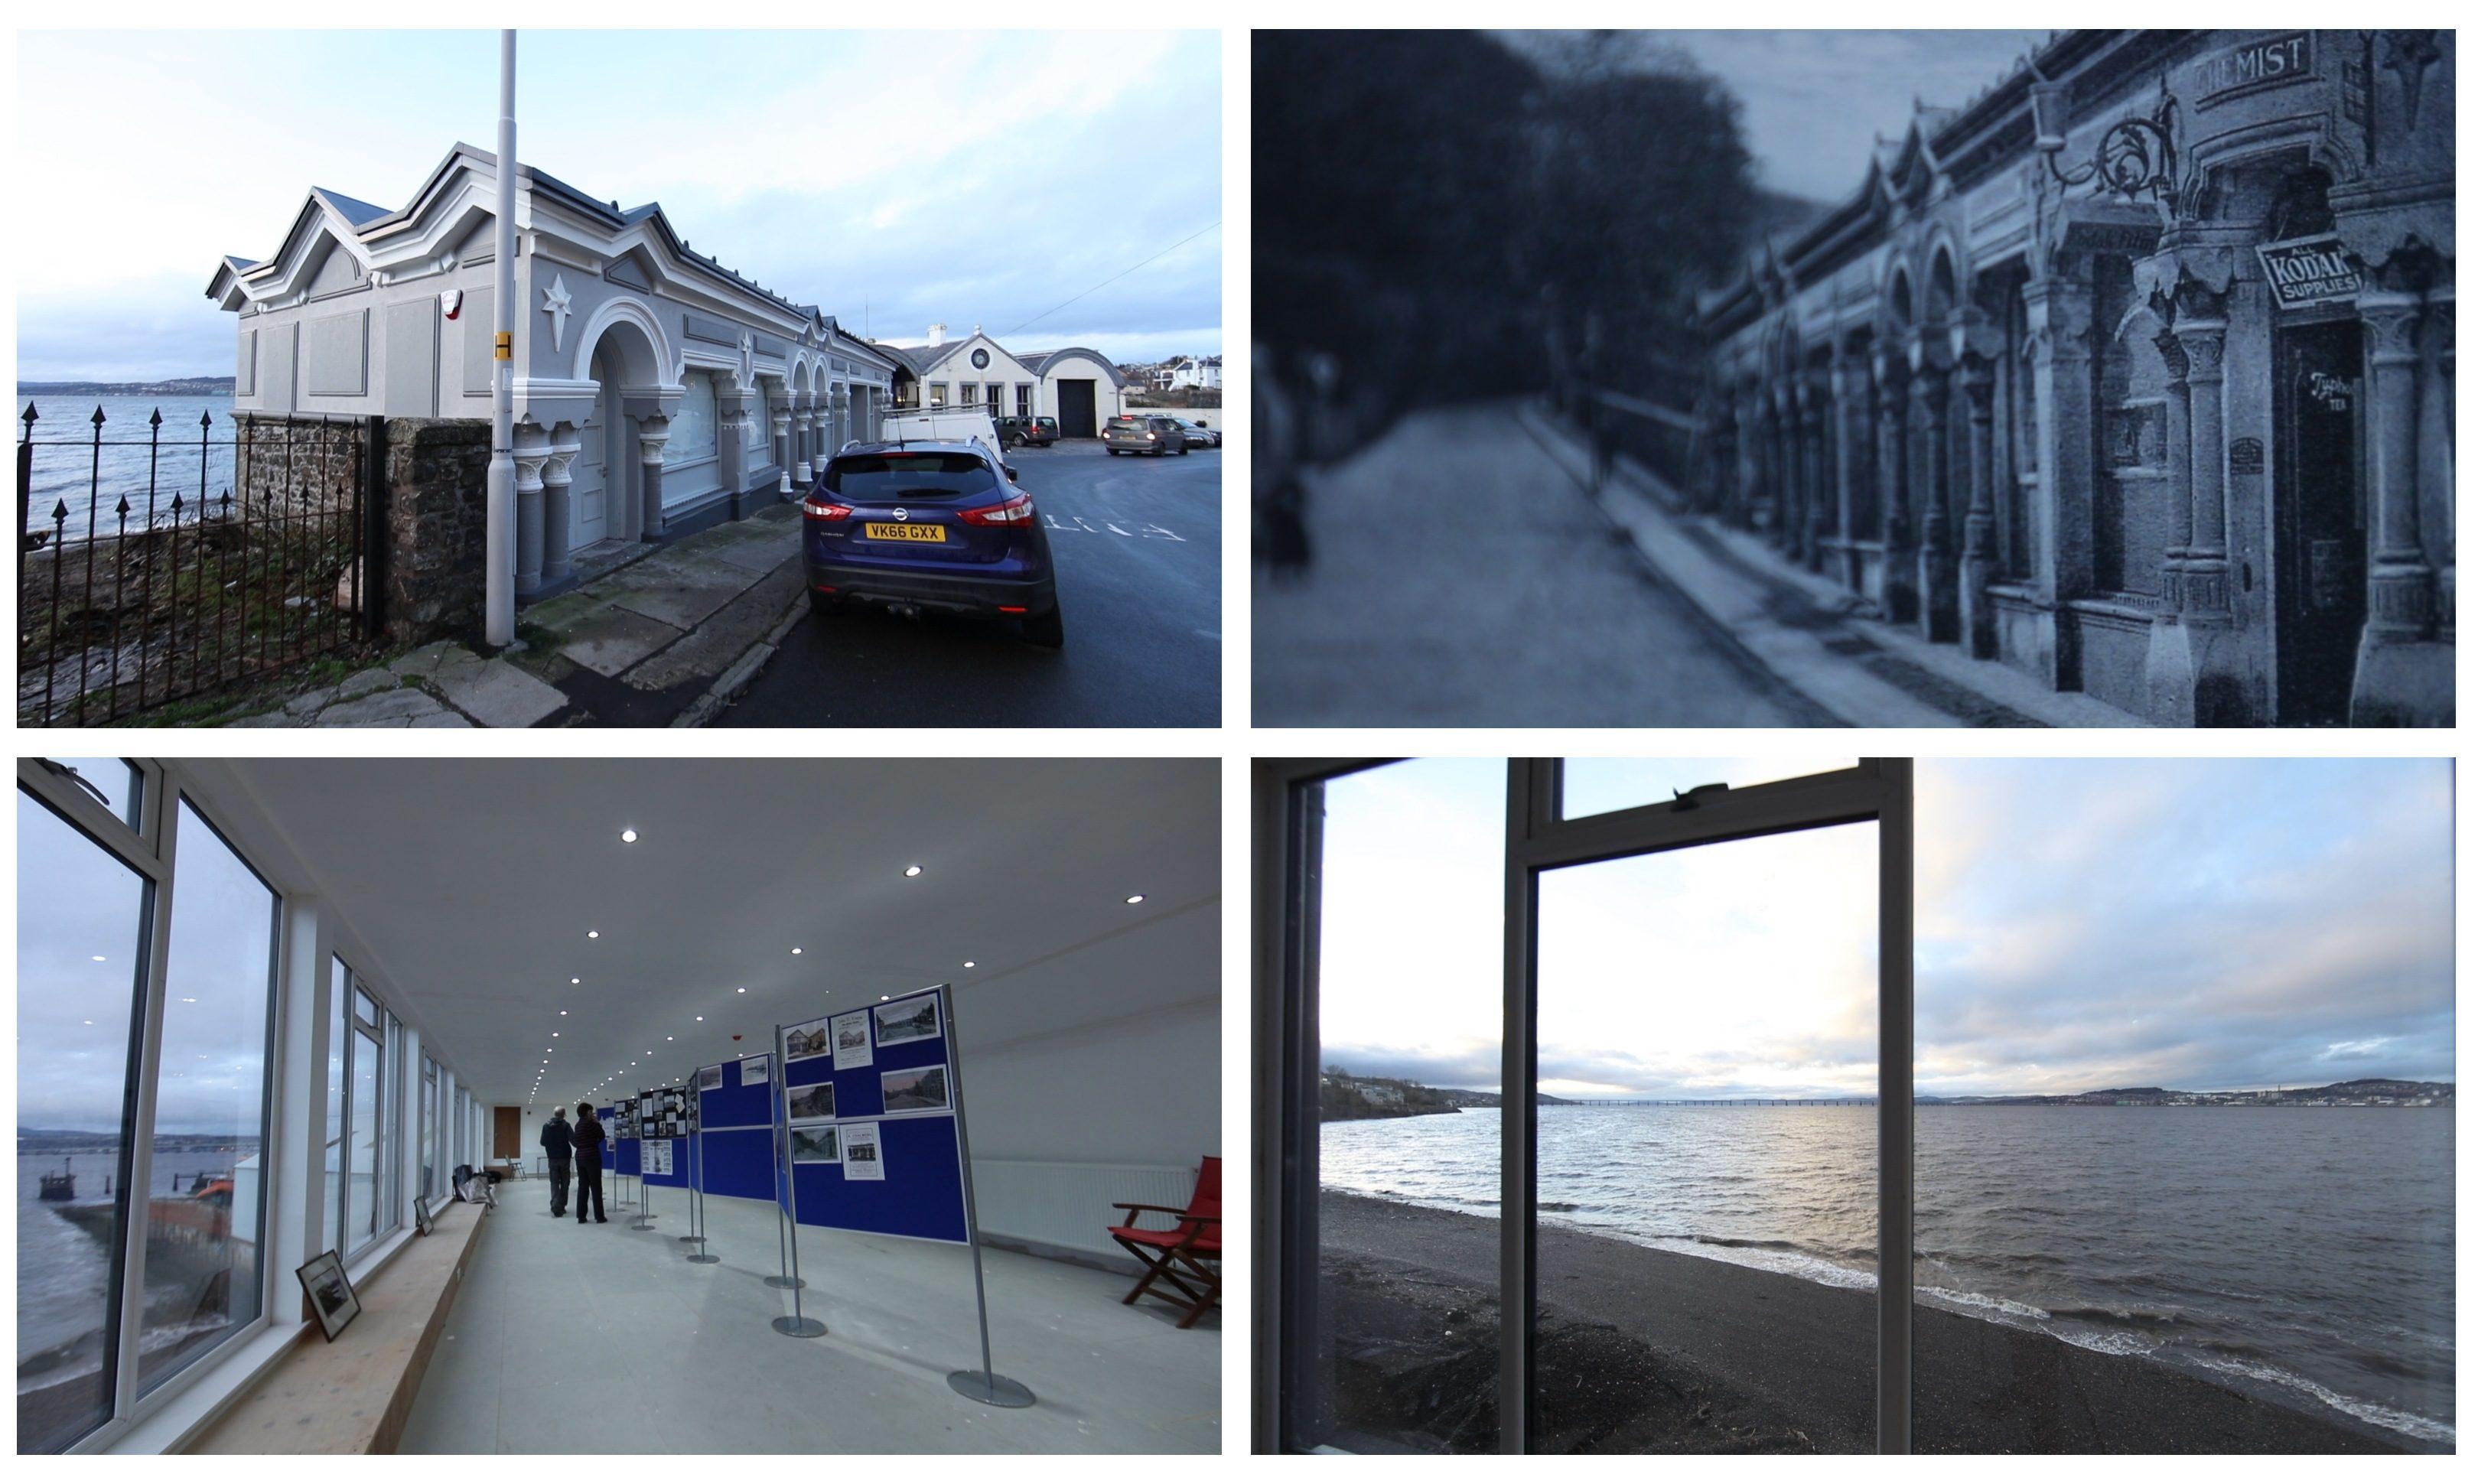 The Newport Pier Buildings have been transformed.